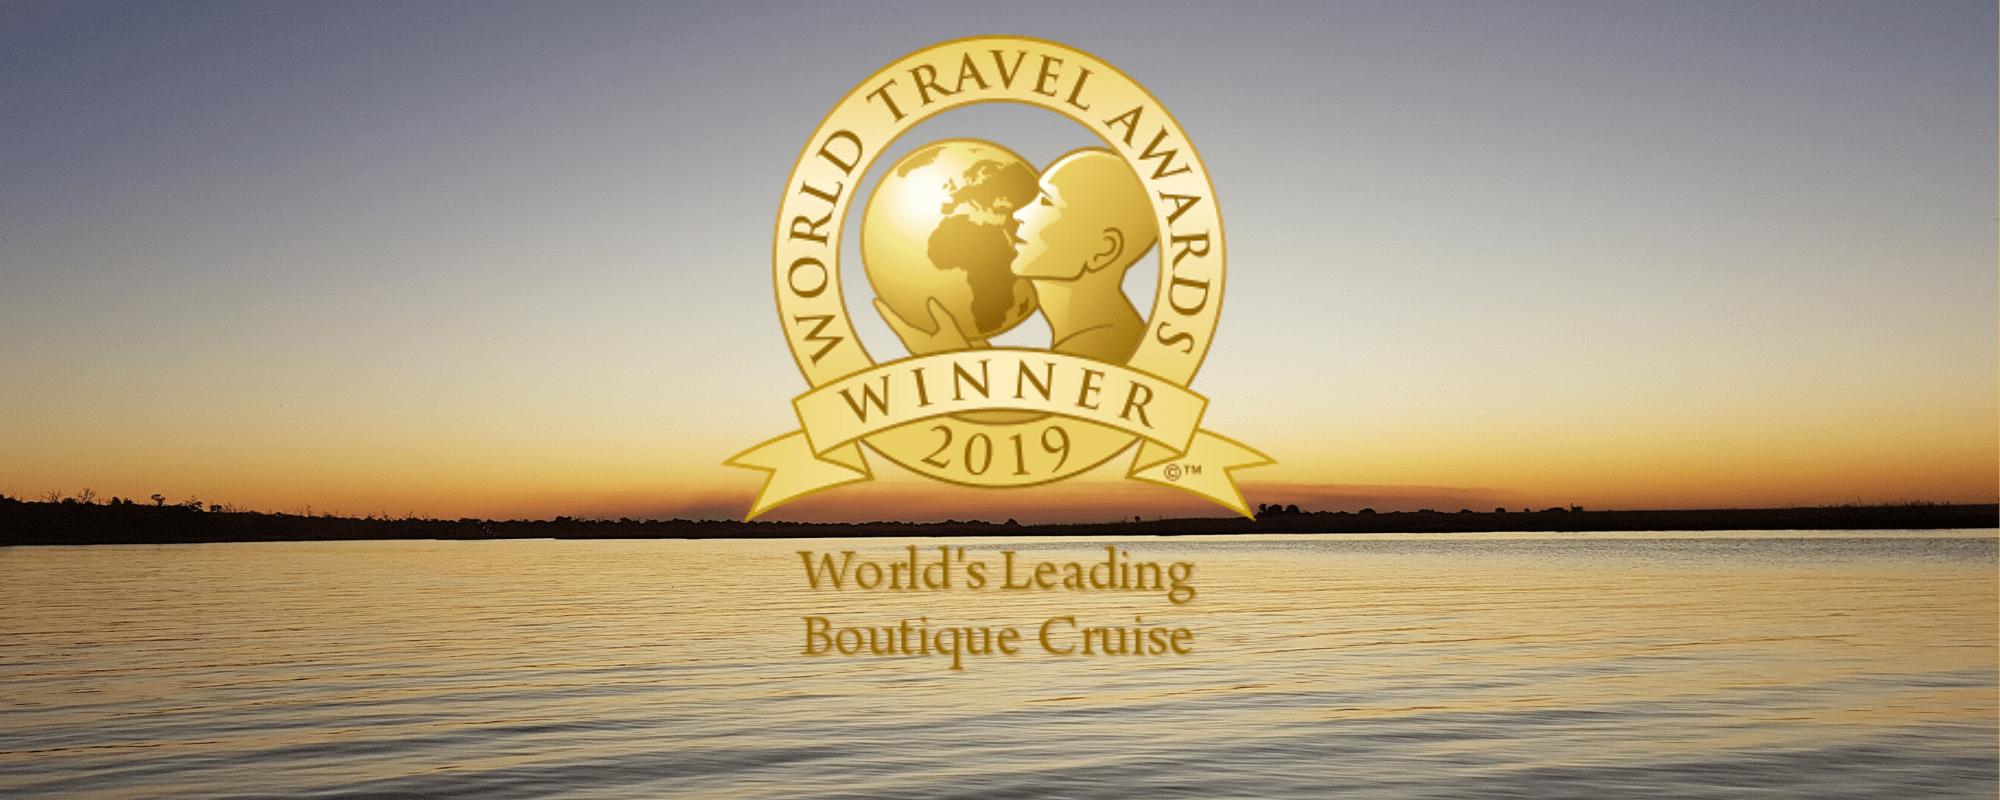 Zambezi Queen Wins At World Travel Awards 2019